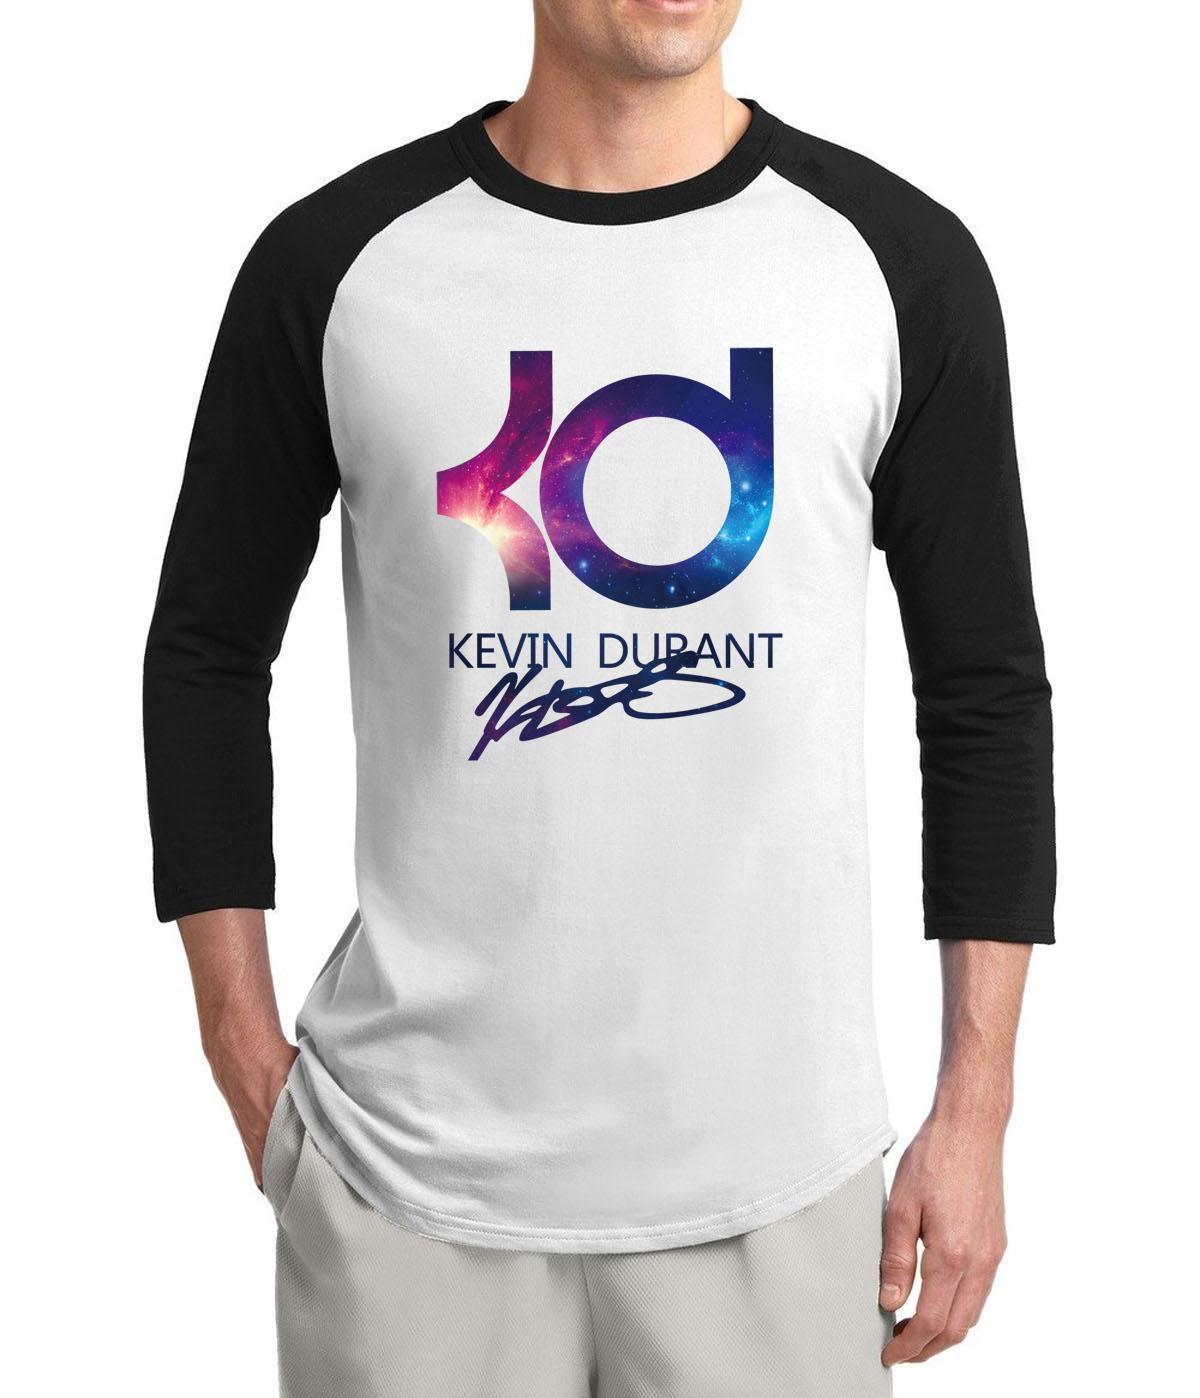 For Fans Kevin Durant KD USA 2017 new summer three quarter sleeve men t shirt 100% cotton high quality slim raglan t-shirt S-2XL(China (Mainland))